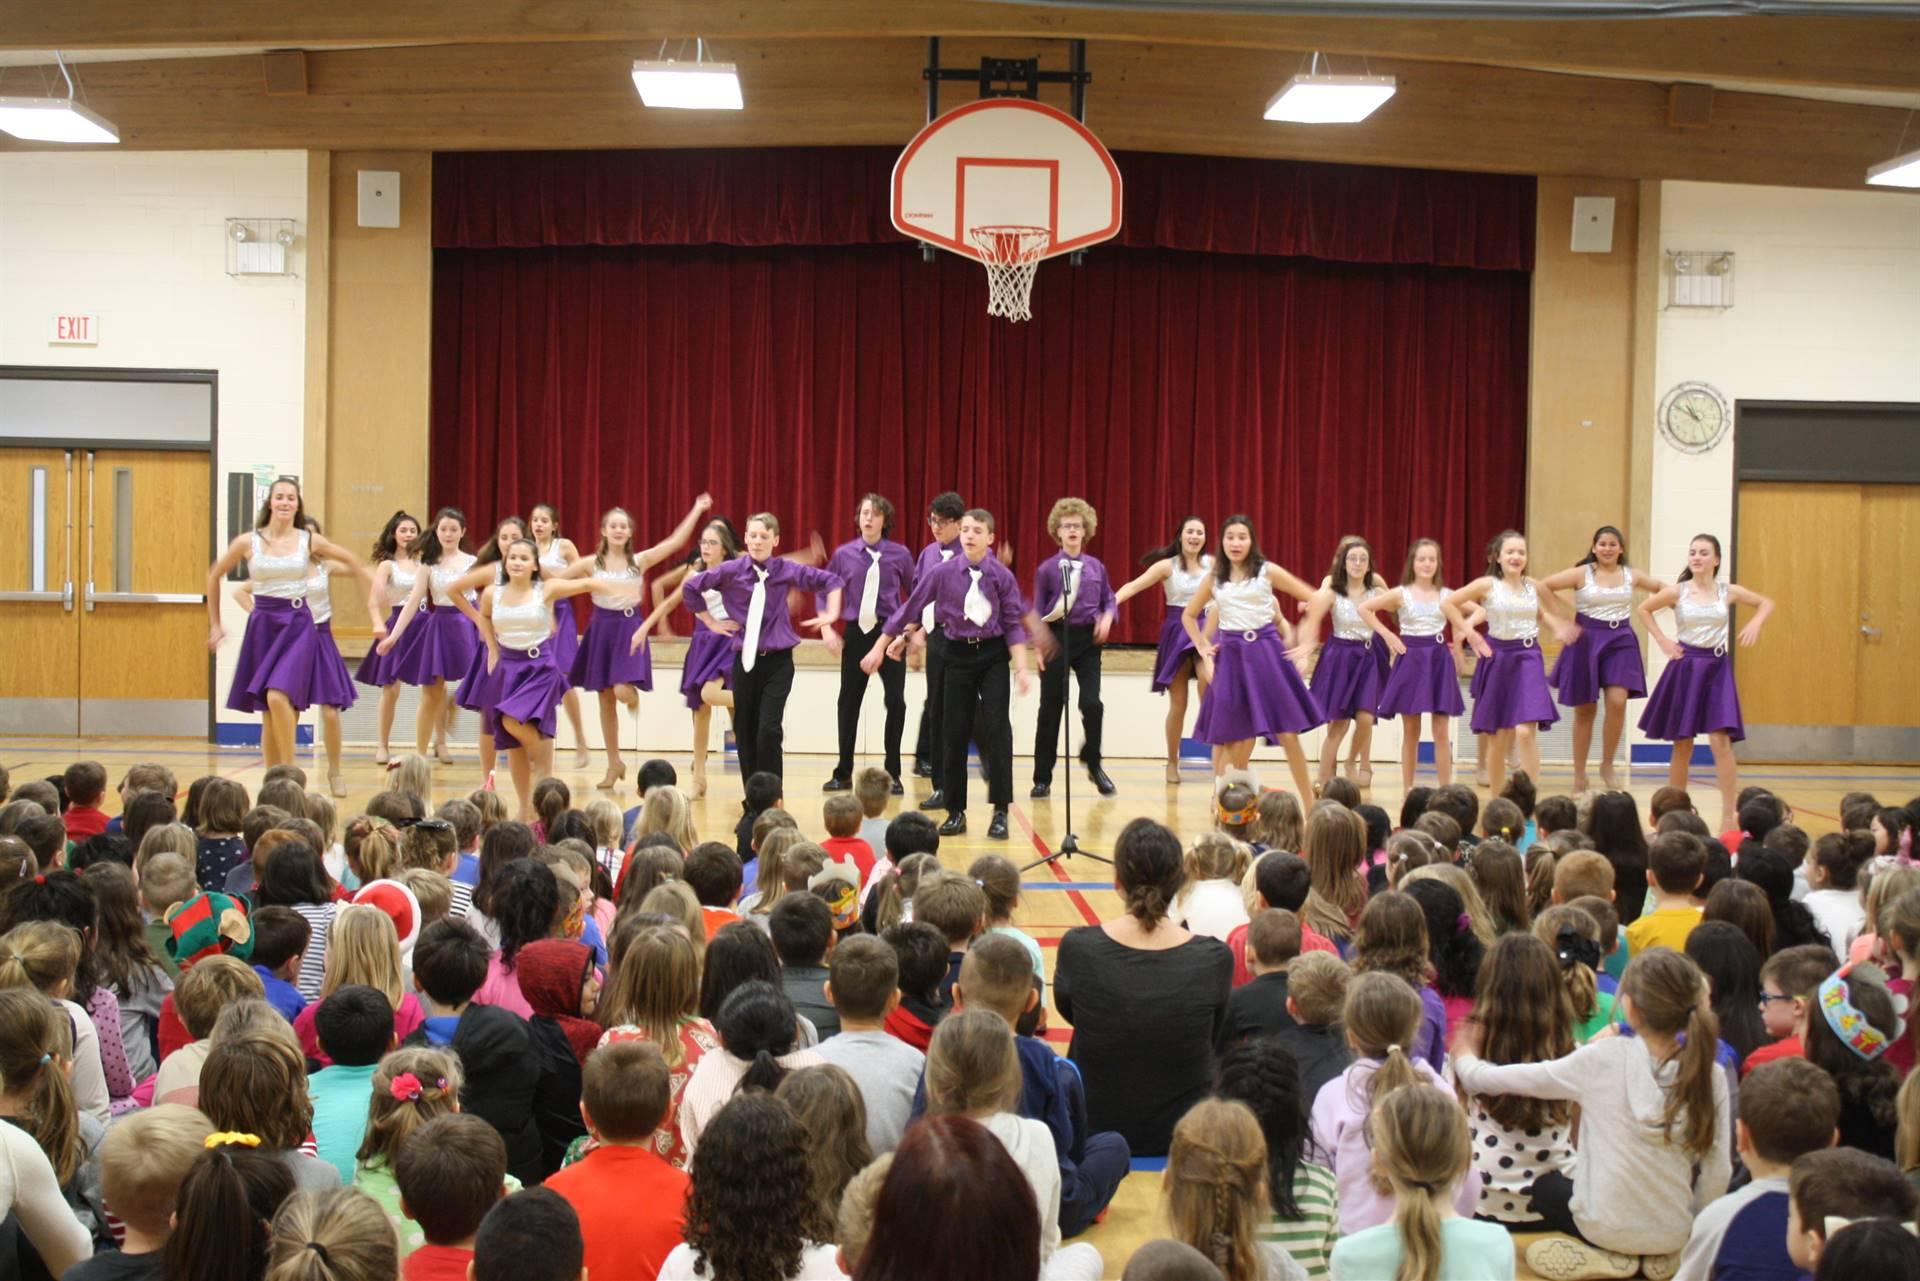 Celebration Singers 12/20/18